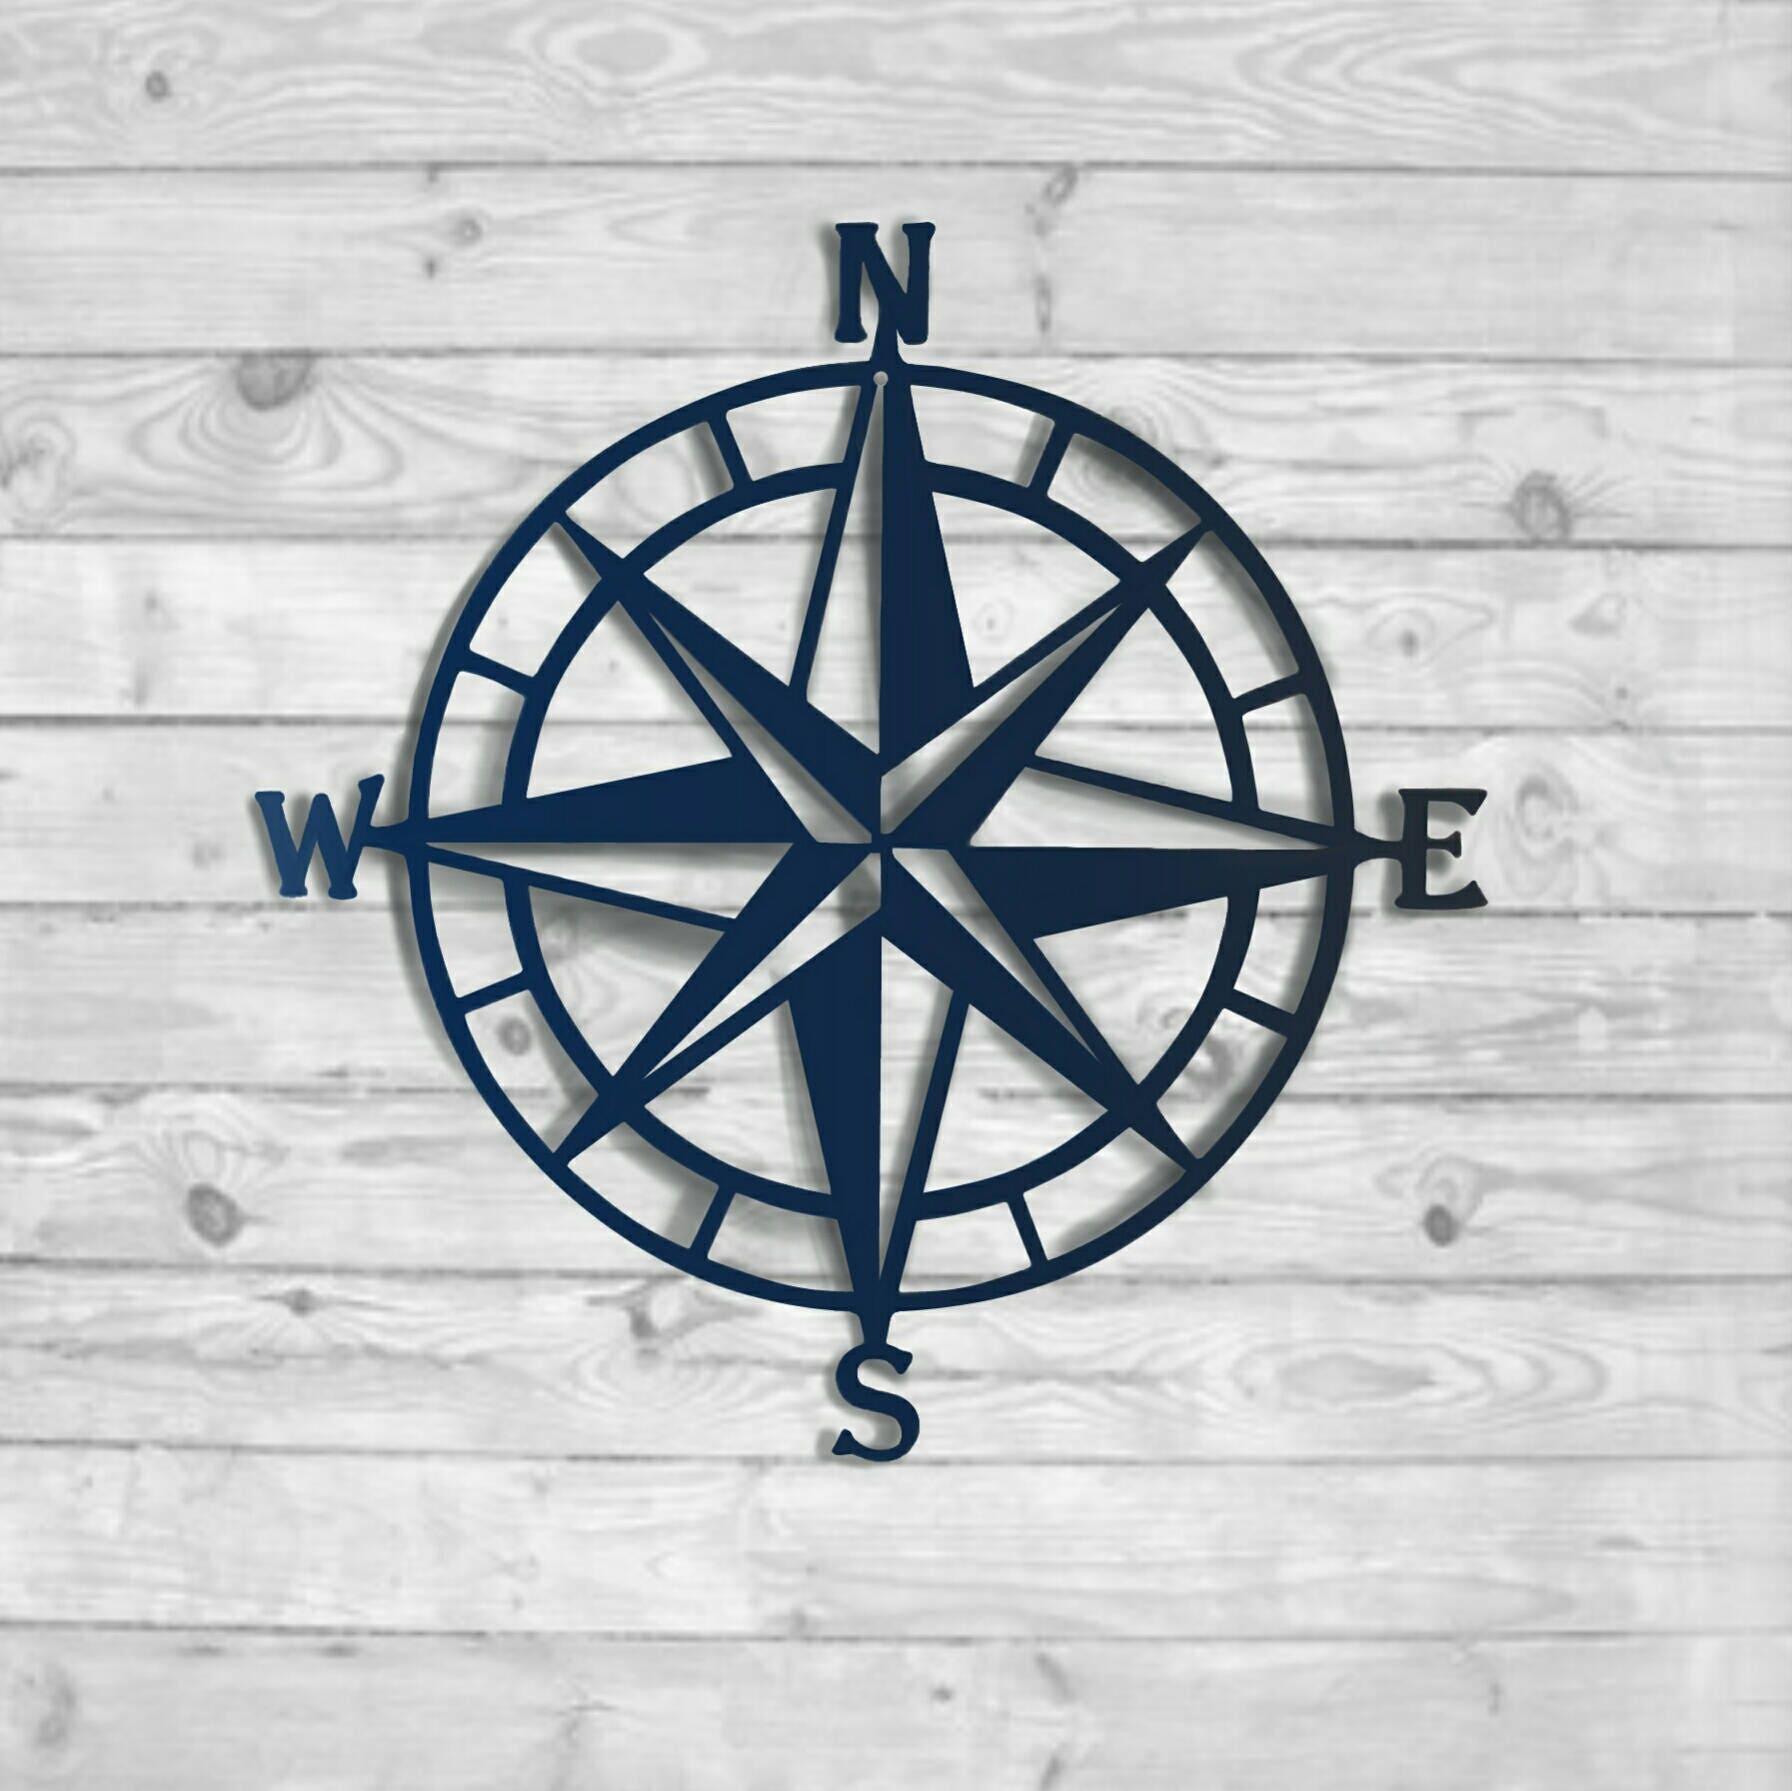 Textured Navy: Nautical Compass   Nautical Wall Art   Metal Wall Art    Nautical Rose Outdoor Metal Art  Wall Decor, HSACOMTN